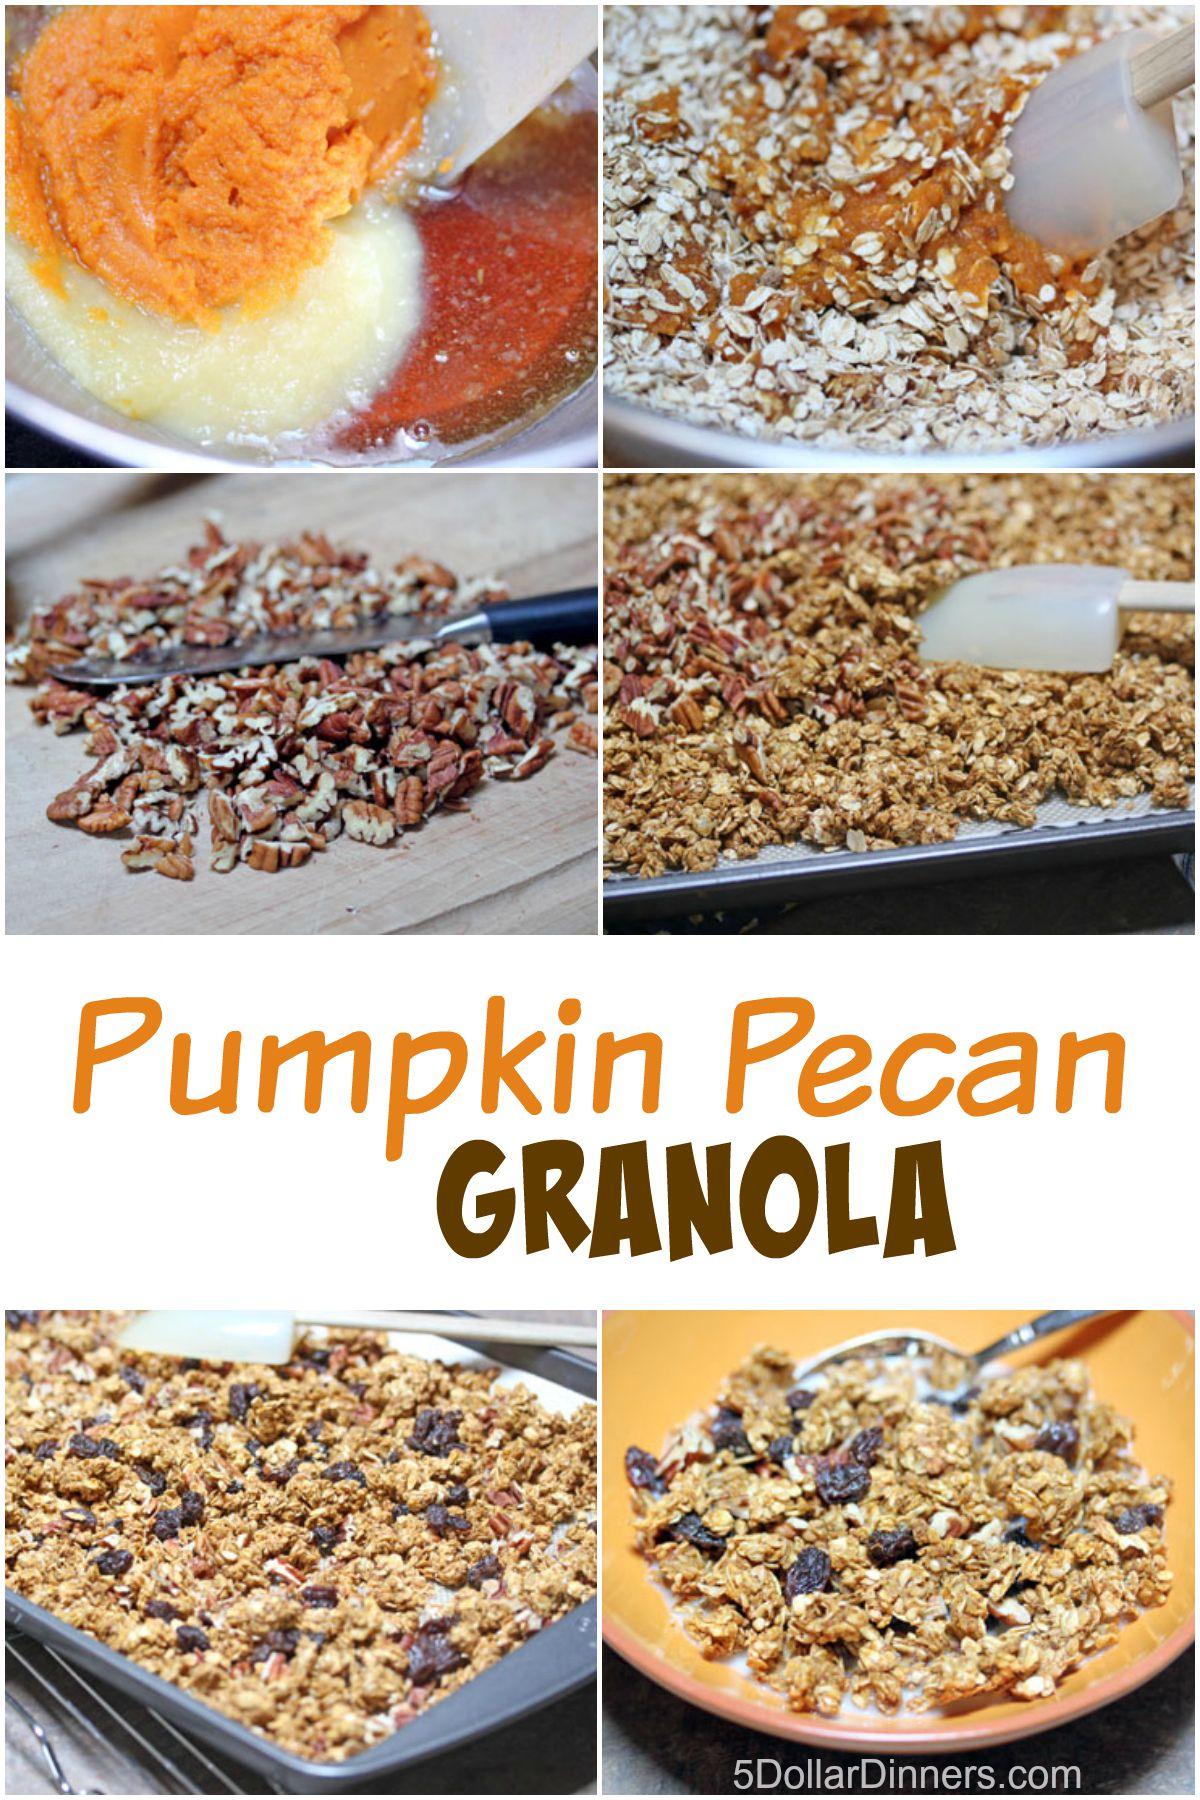 Pumpkin Pecan Granola from 5DollarDinners.com